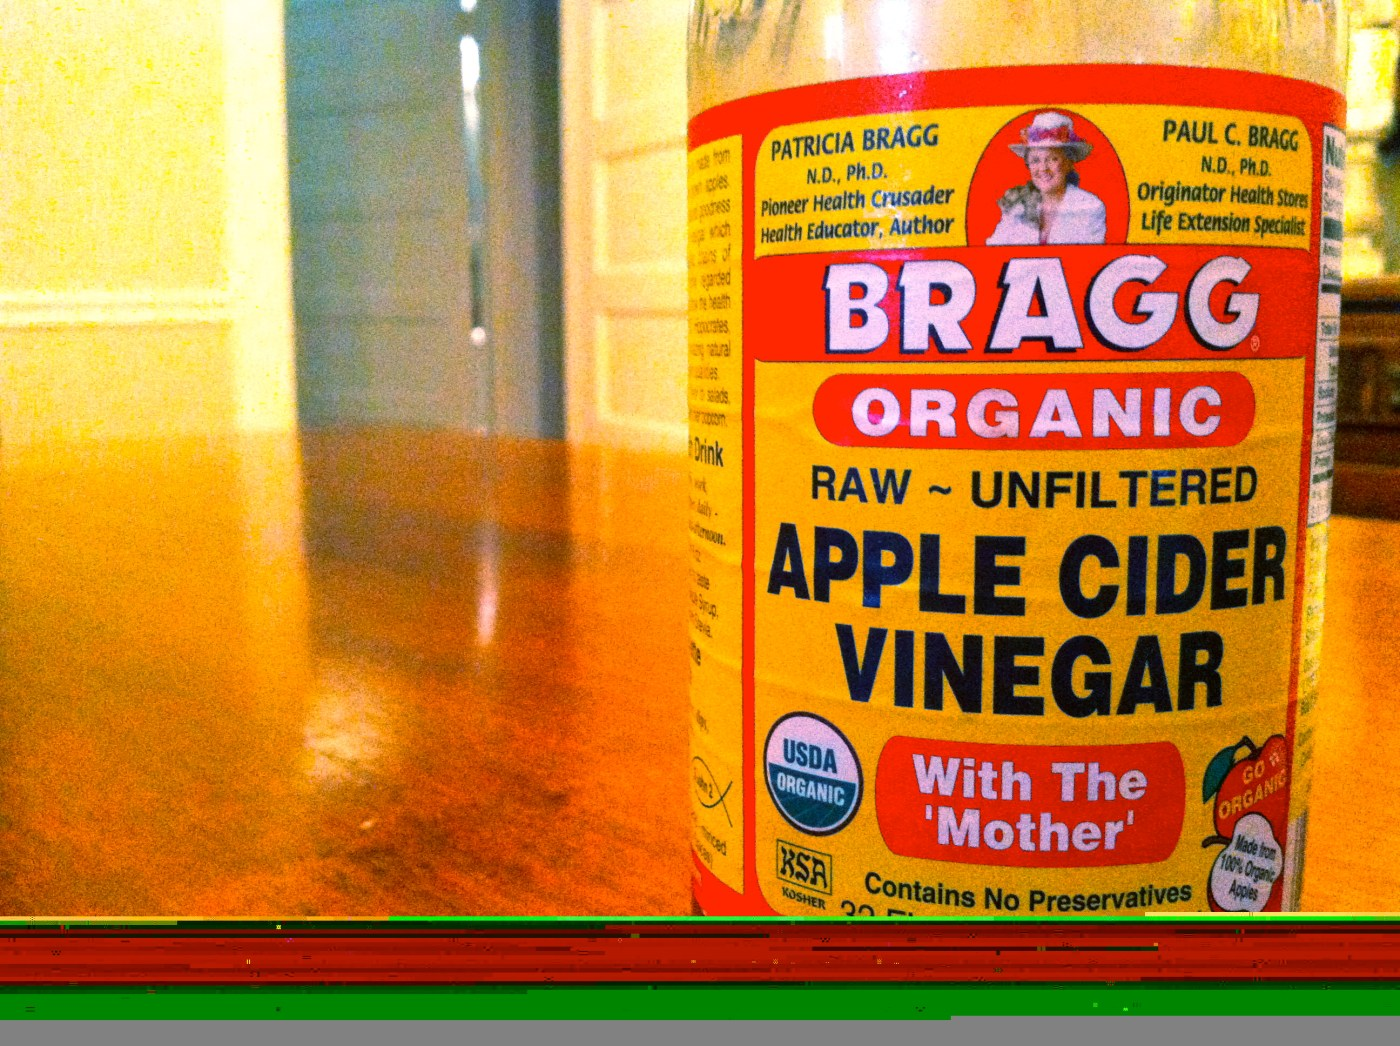 The Amazing Health Benefits of Apple Cider Vinegar